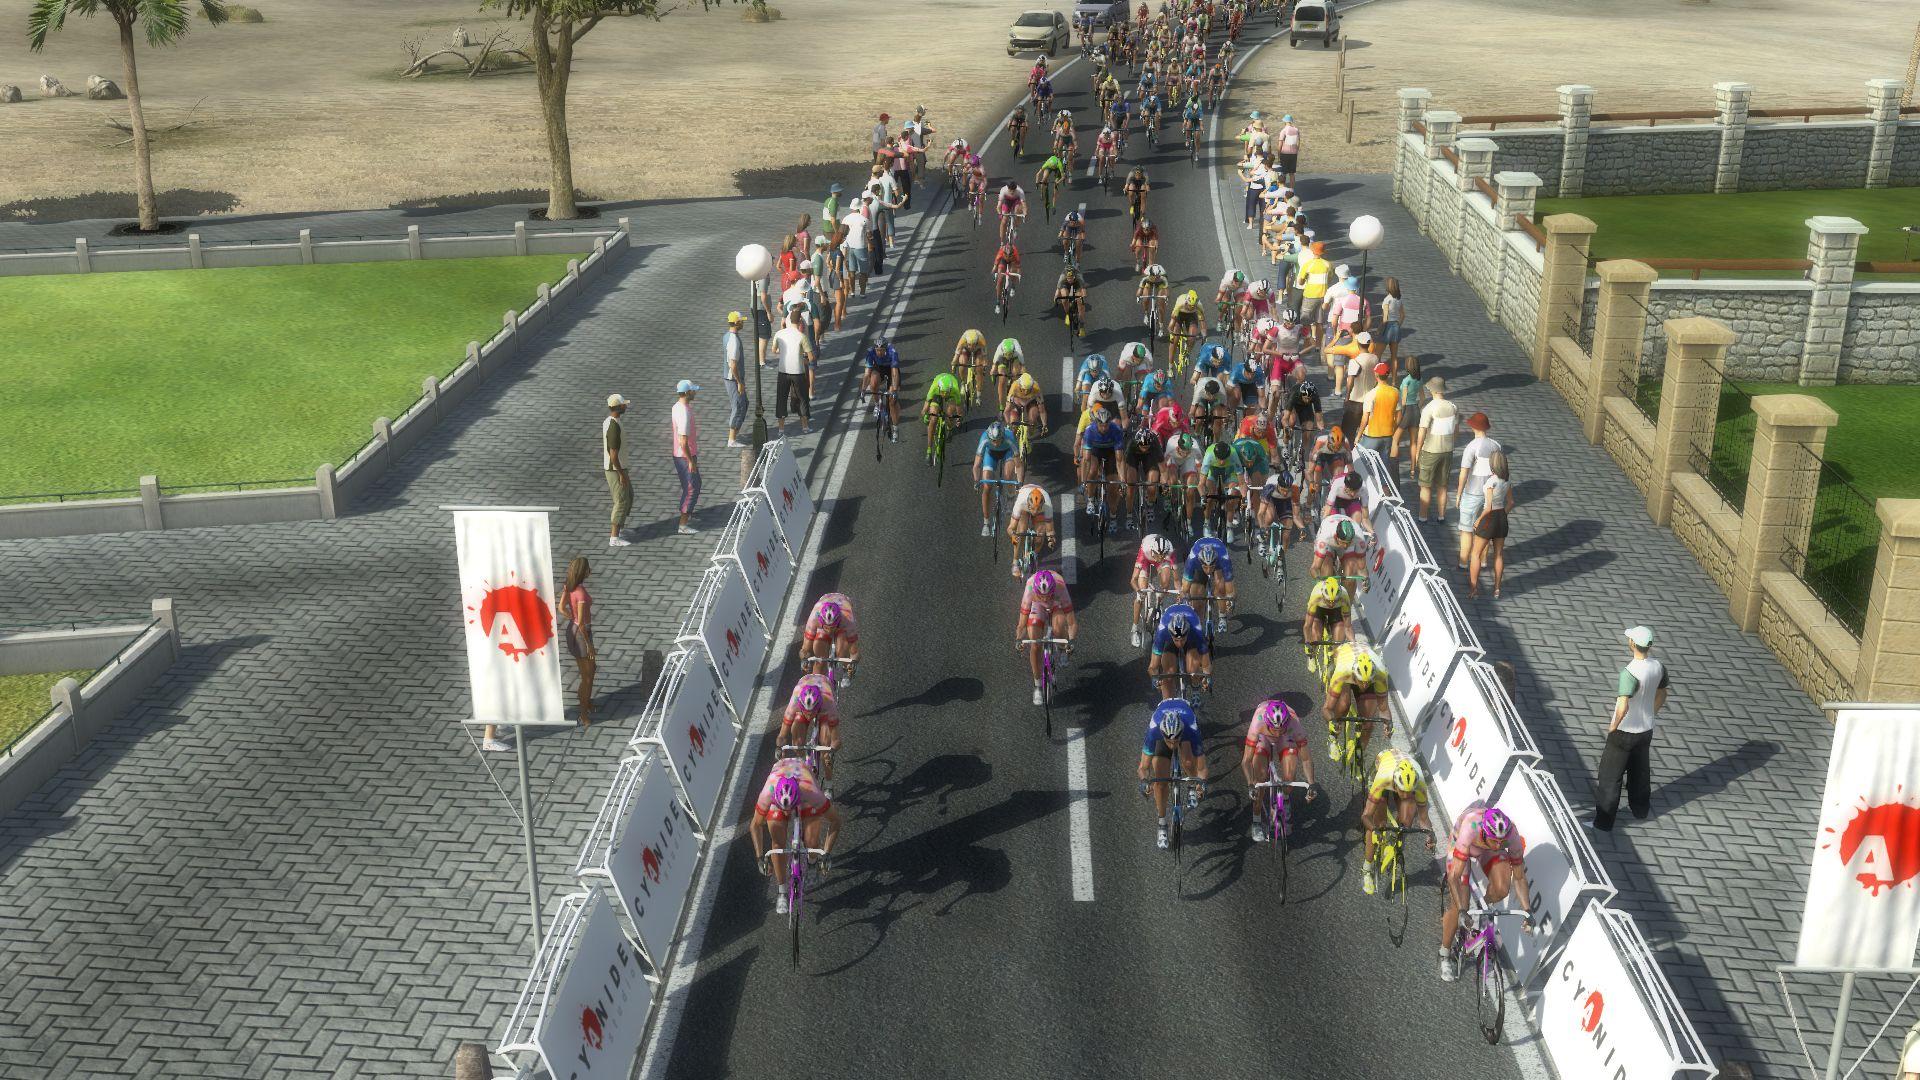 pcmdaily.com/images/mg/2019/Races/PT/Qatar/mg19_qat_s04_13.jpg